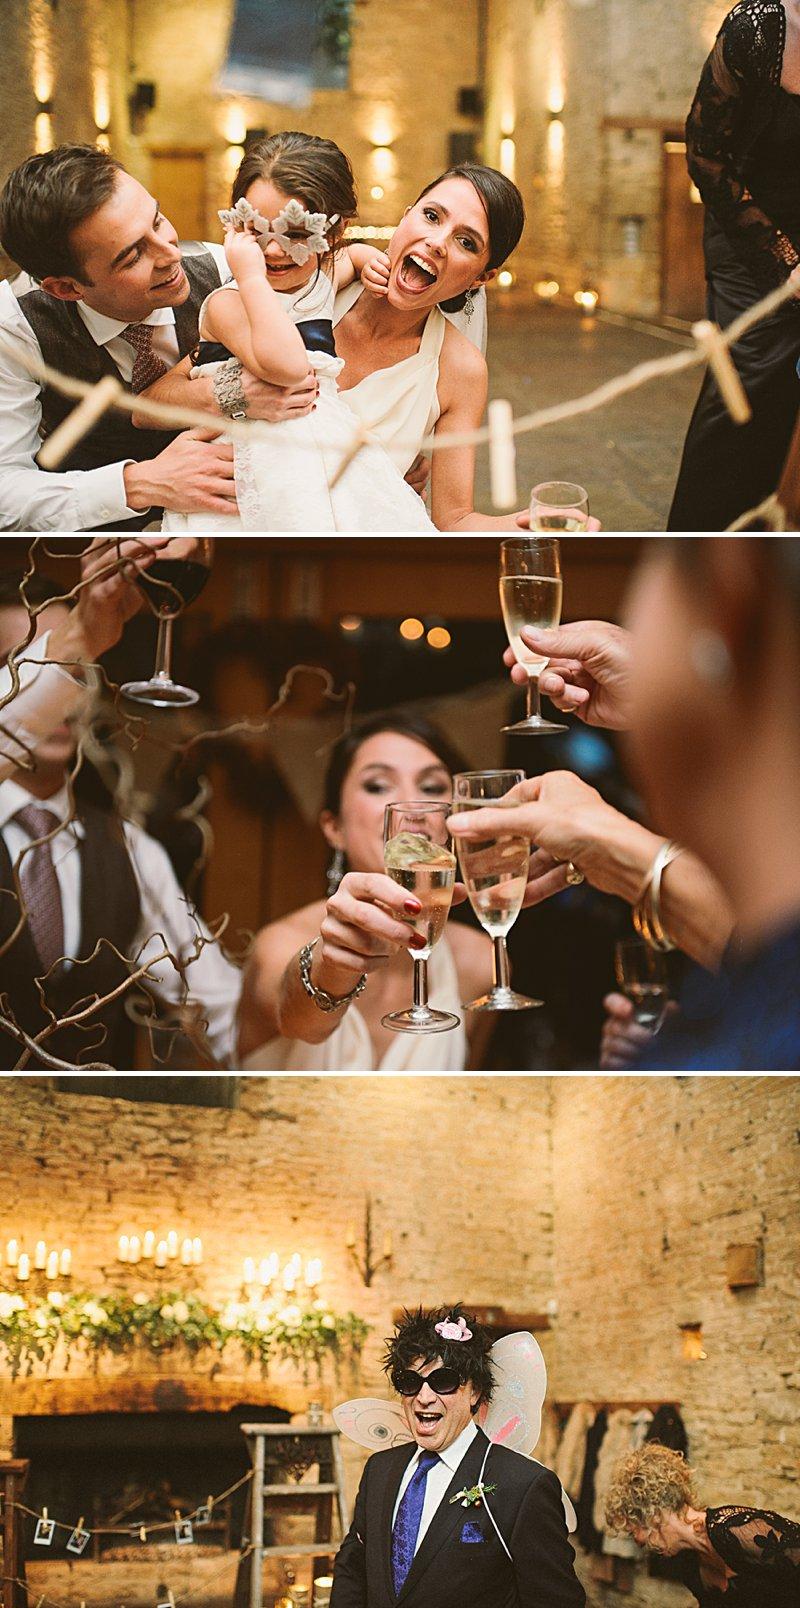 Lisa & Alex's wedding at Cripps Barn